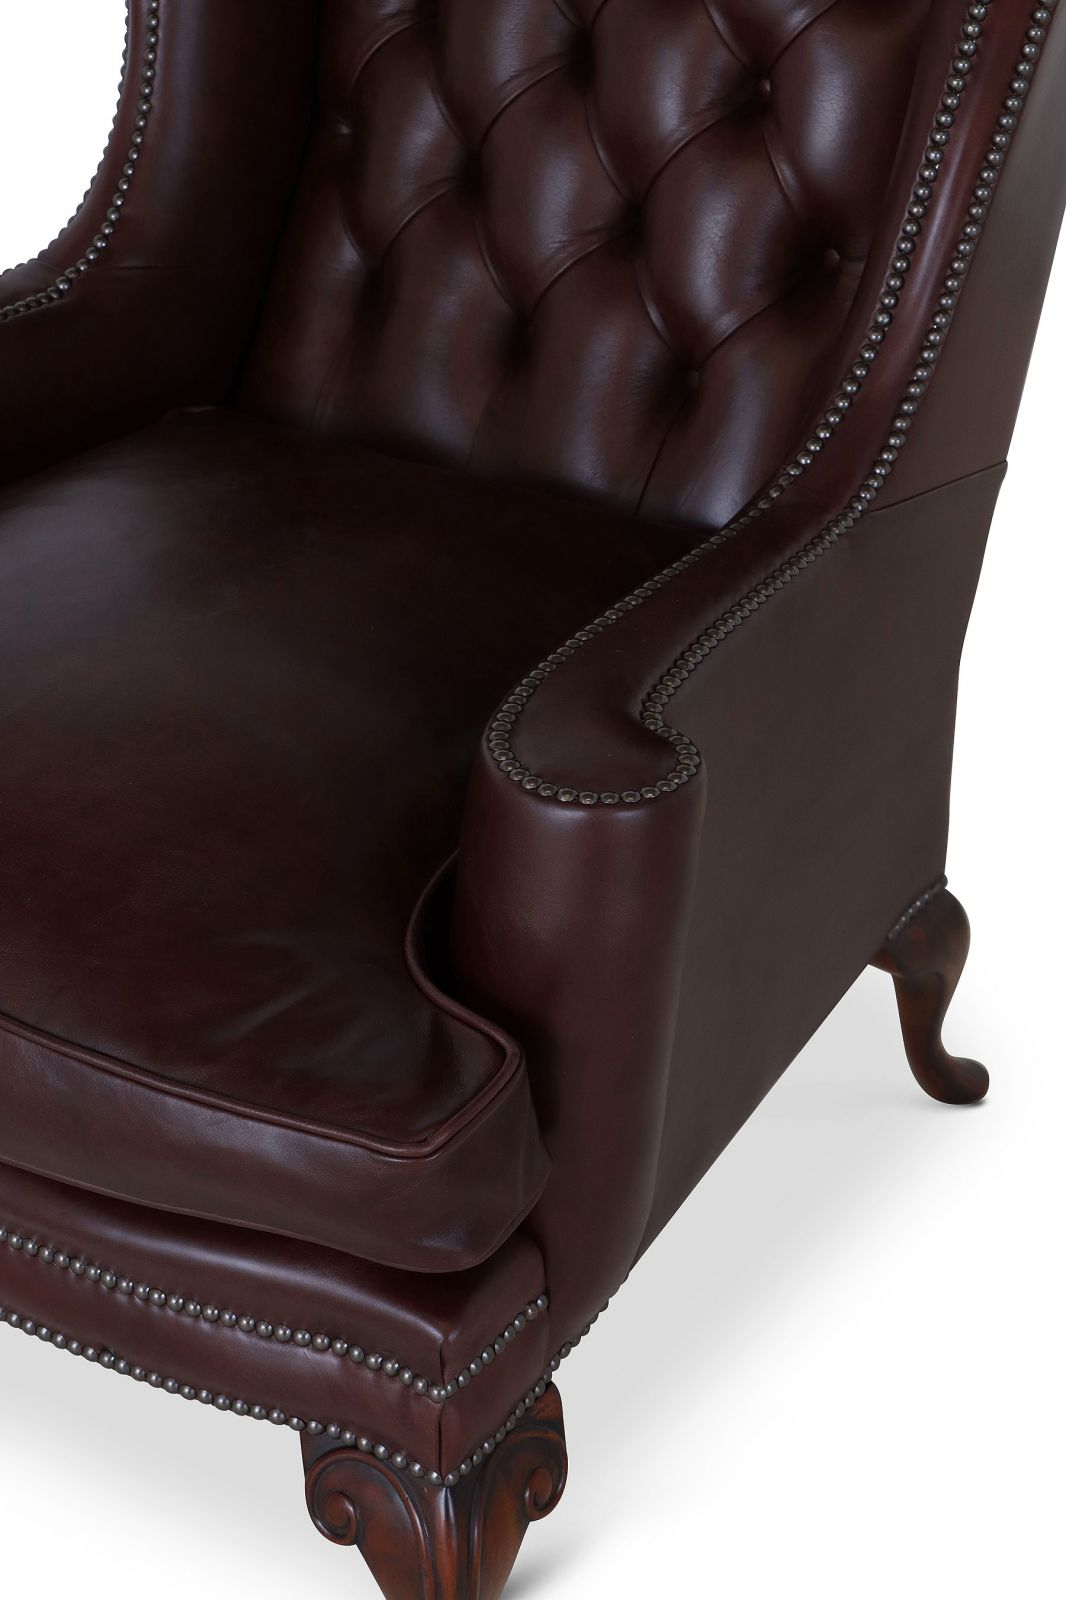 Melbury Dark Brown Leather Wing Chair